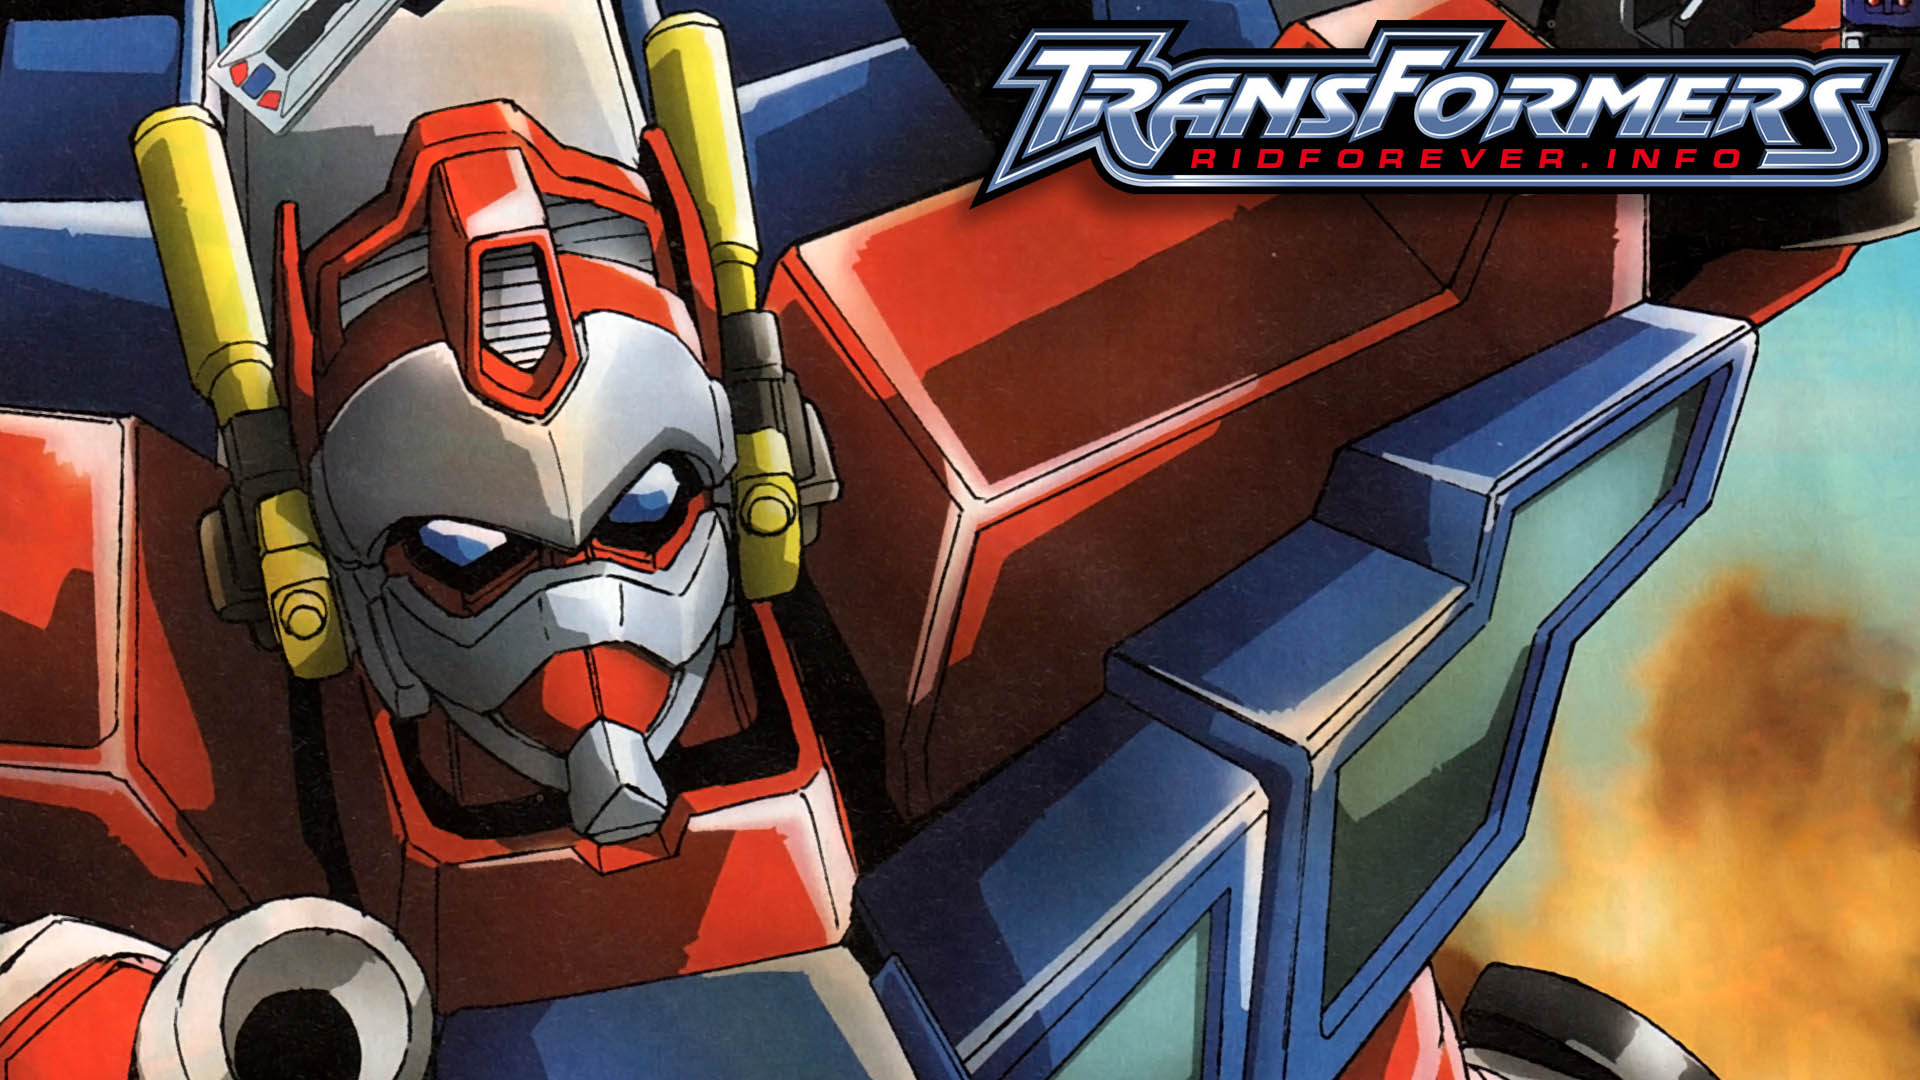 RID Omega Prime 3 HD